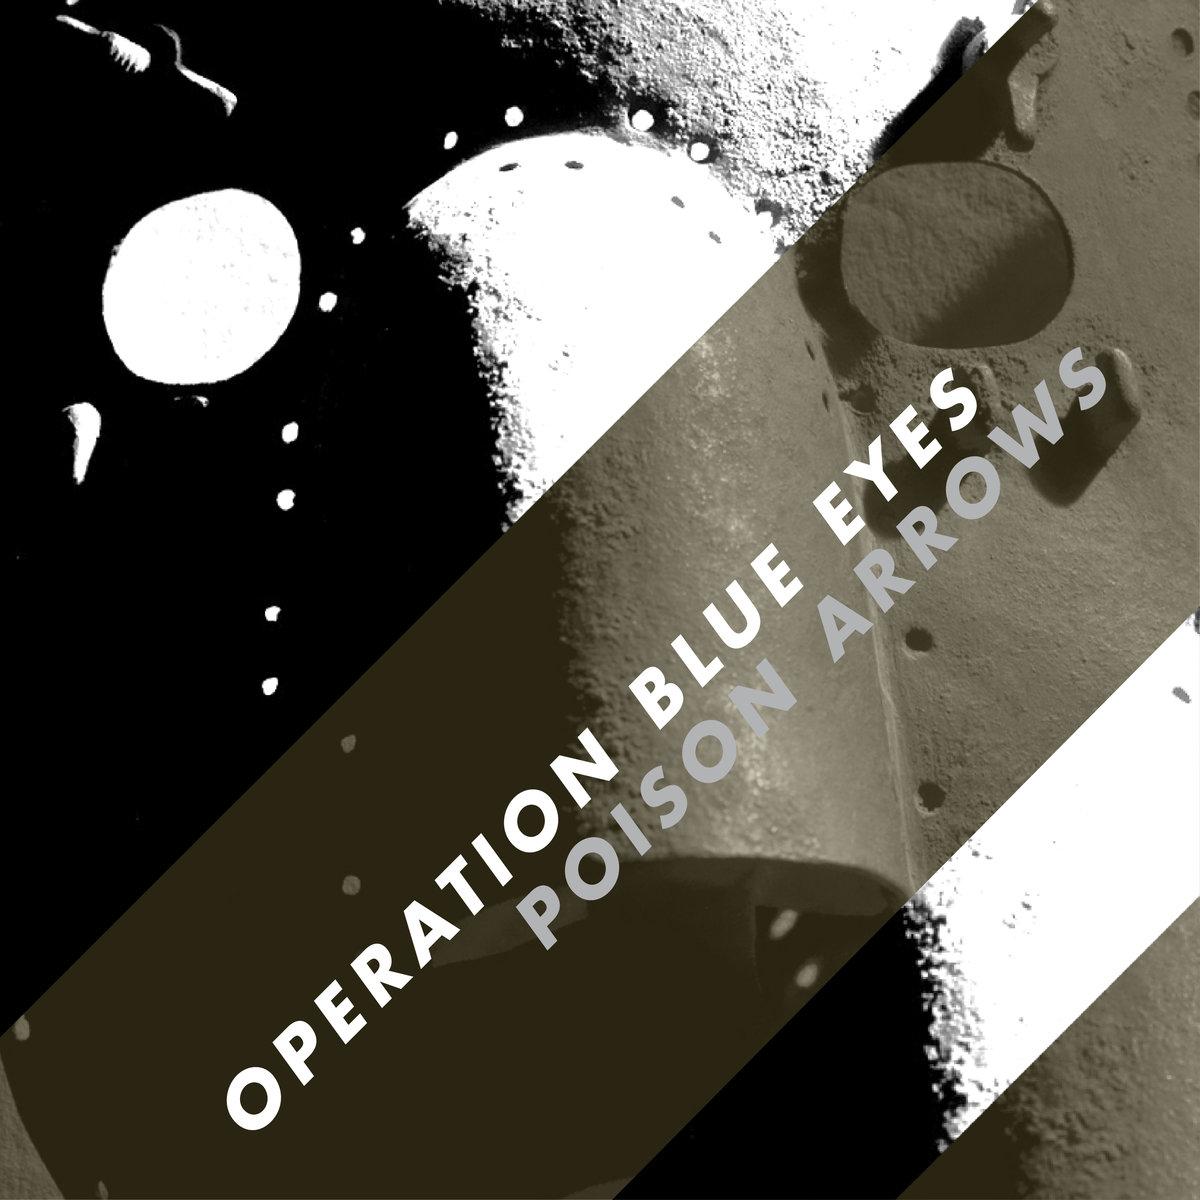 Electro News @ – Operation Blue Eyes – Poison Arrows